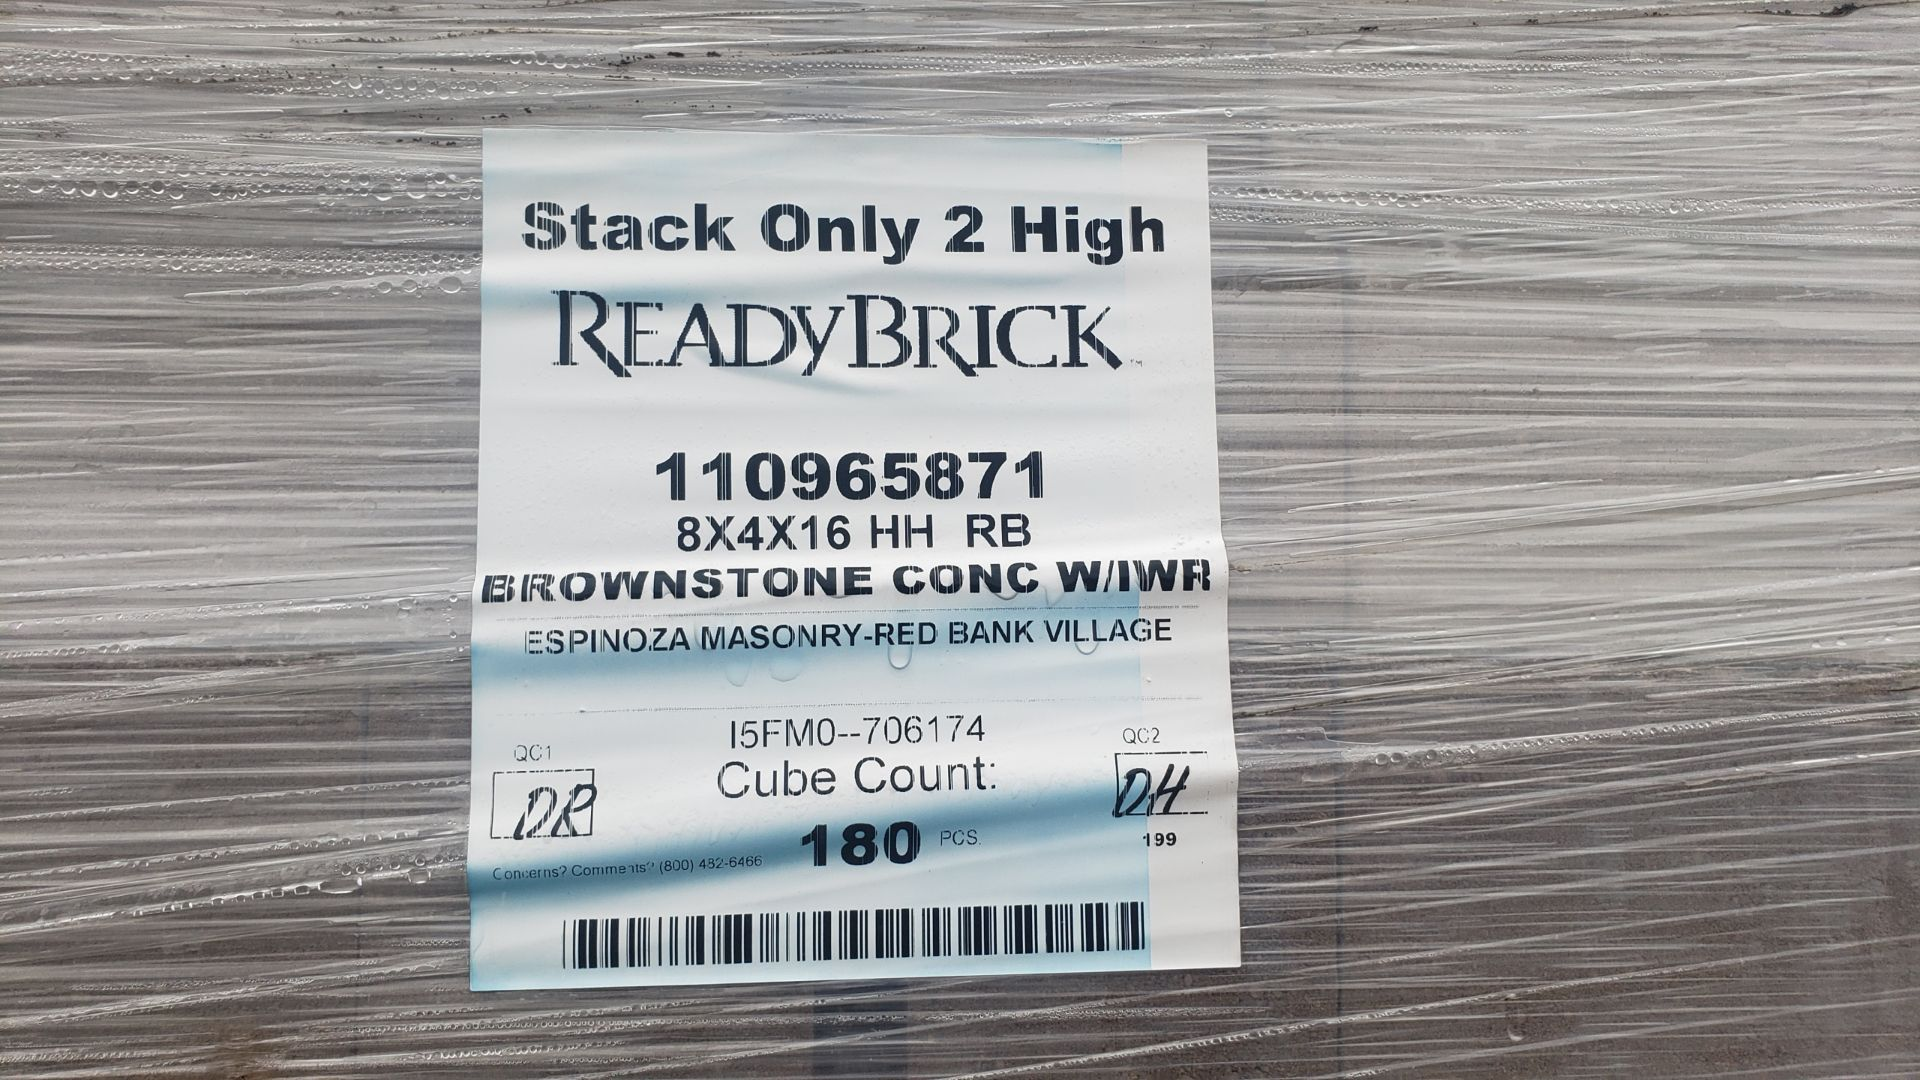 Lot 41 - (42) Skids ReadyBrick 8x4x16 HH RB, Brownstone Conc W/IWR 180 count per skid